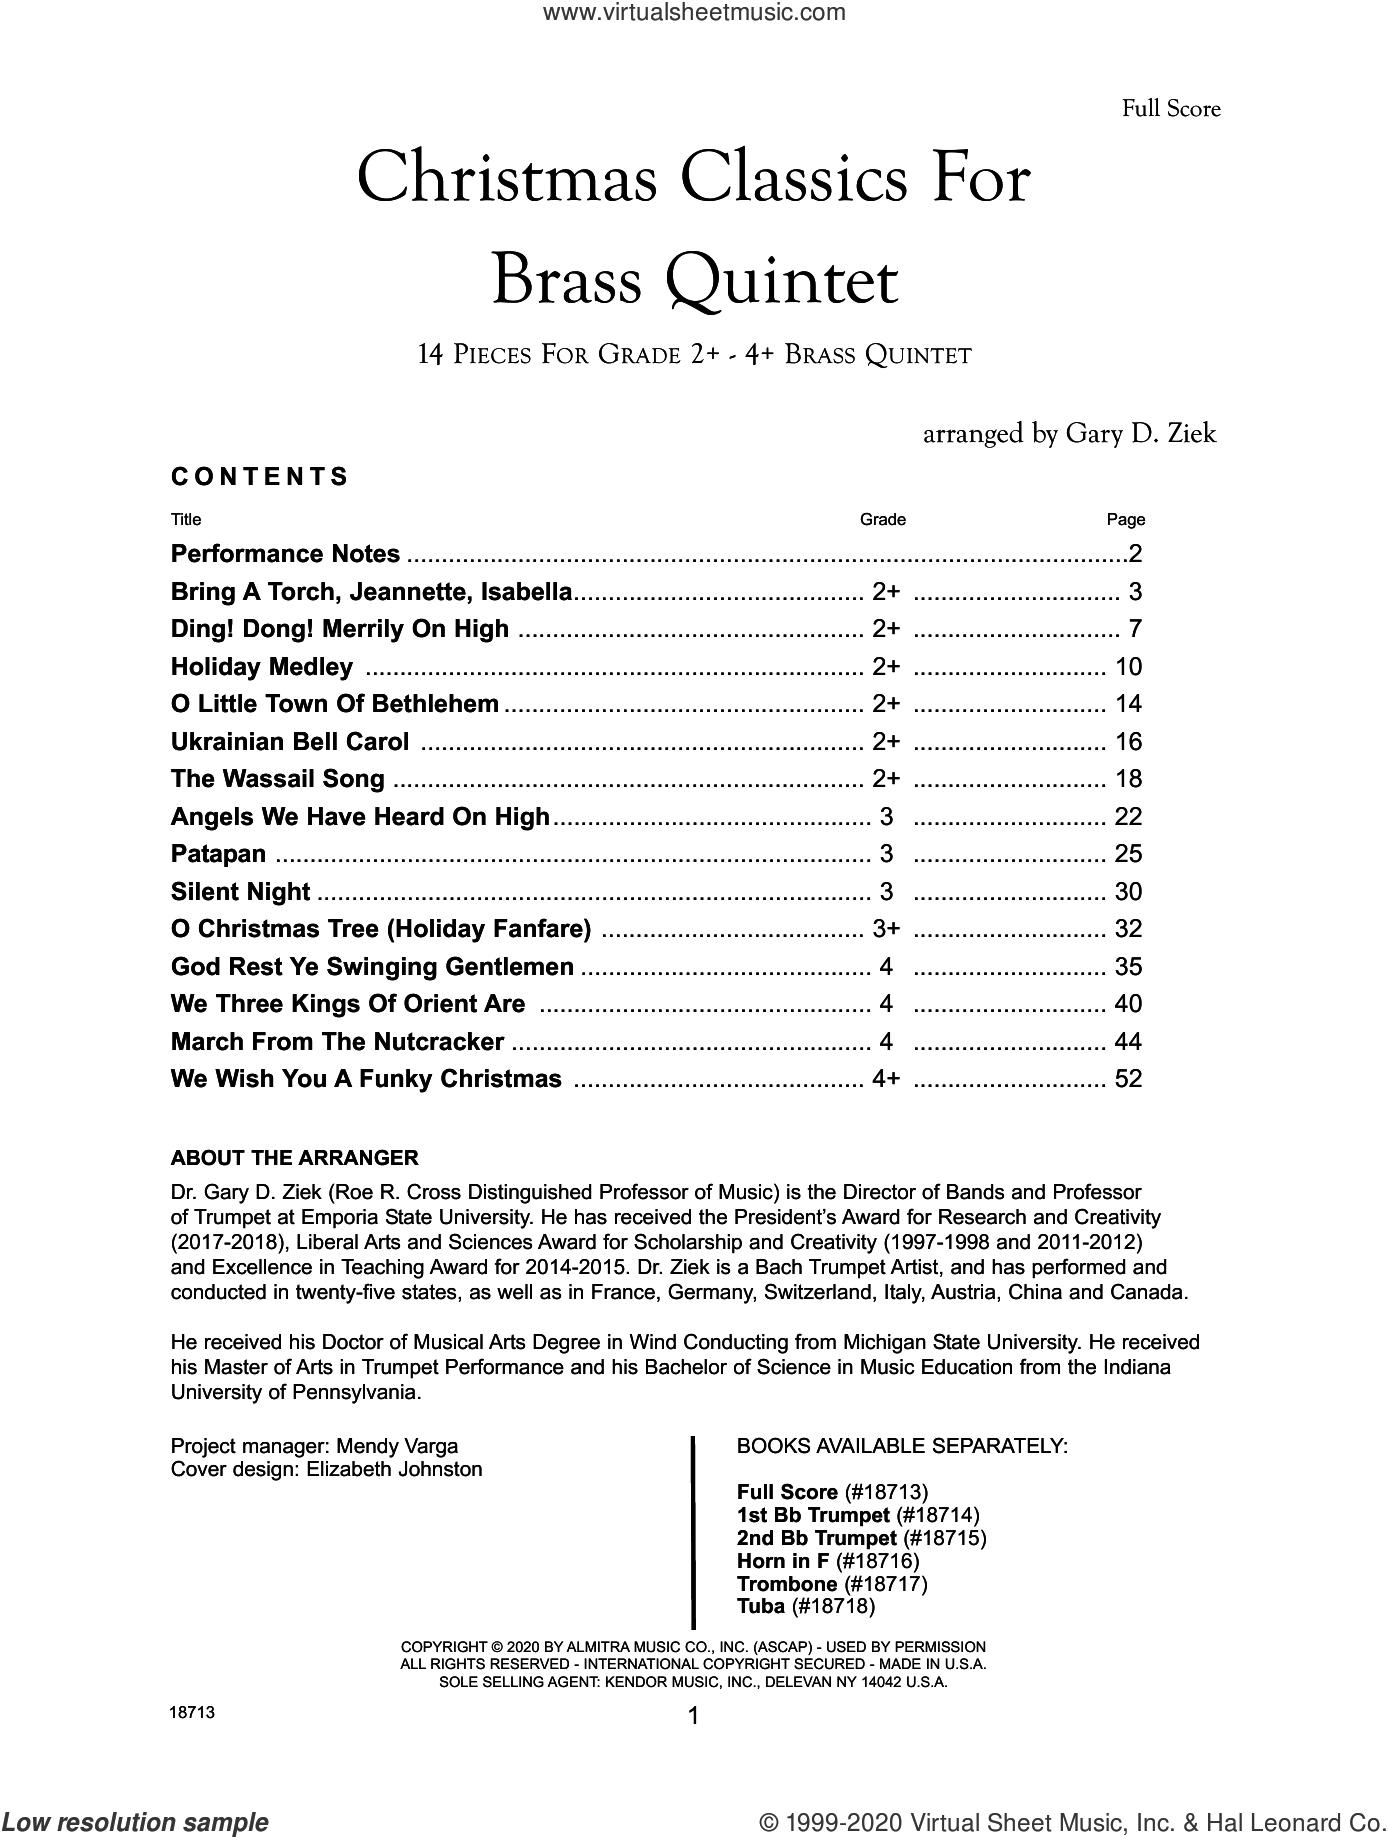 Christmas Classics For Brass Quintet - Full Score sheet music for brass quintet by Gary Ziek and Miscellaneous, intermediate skill level